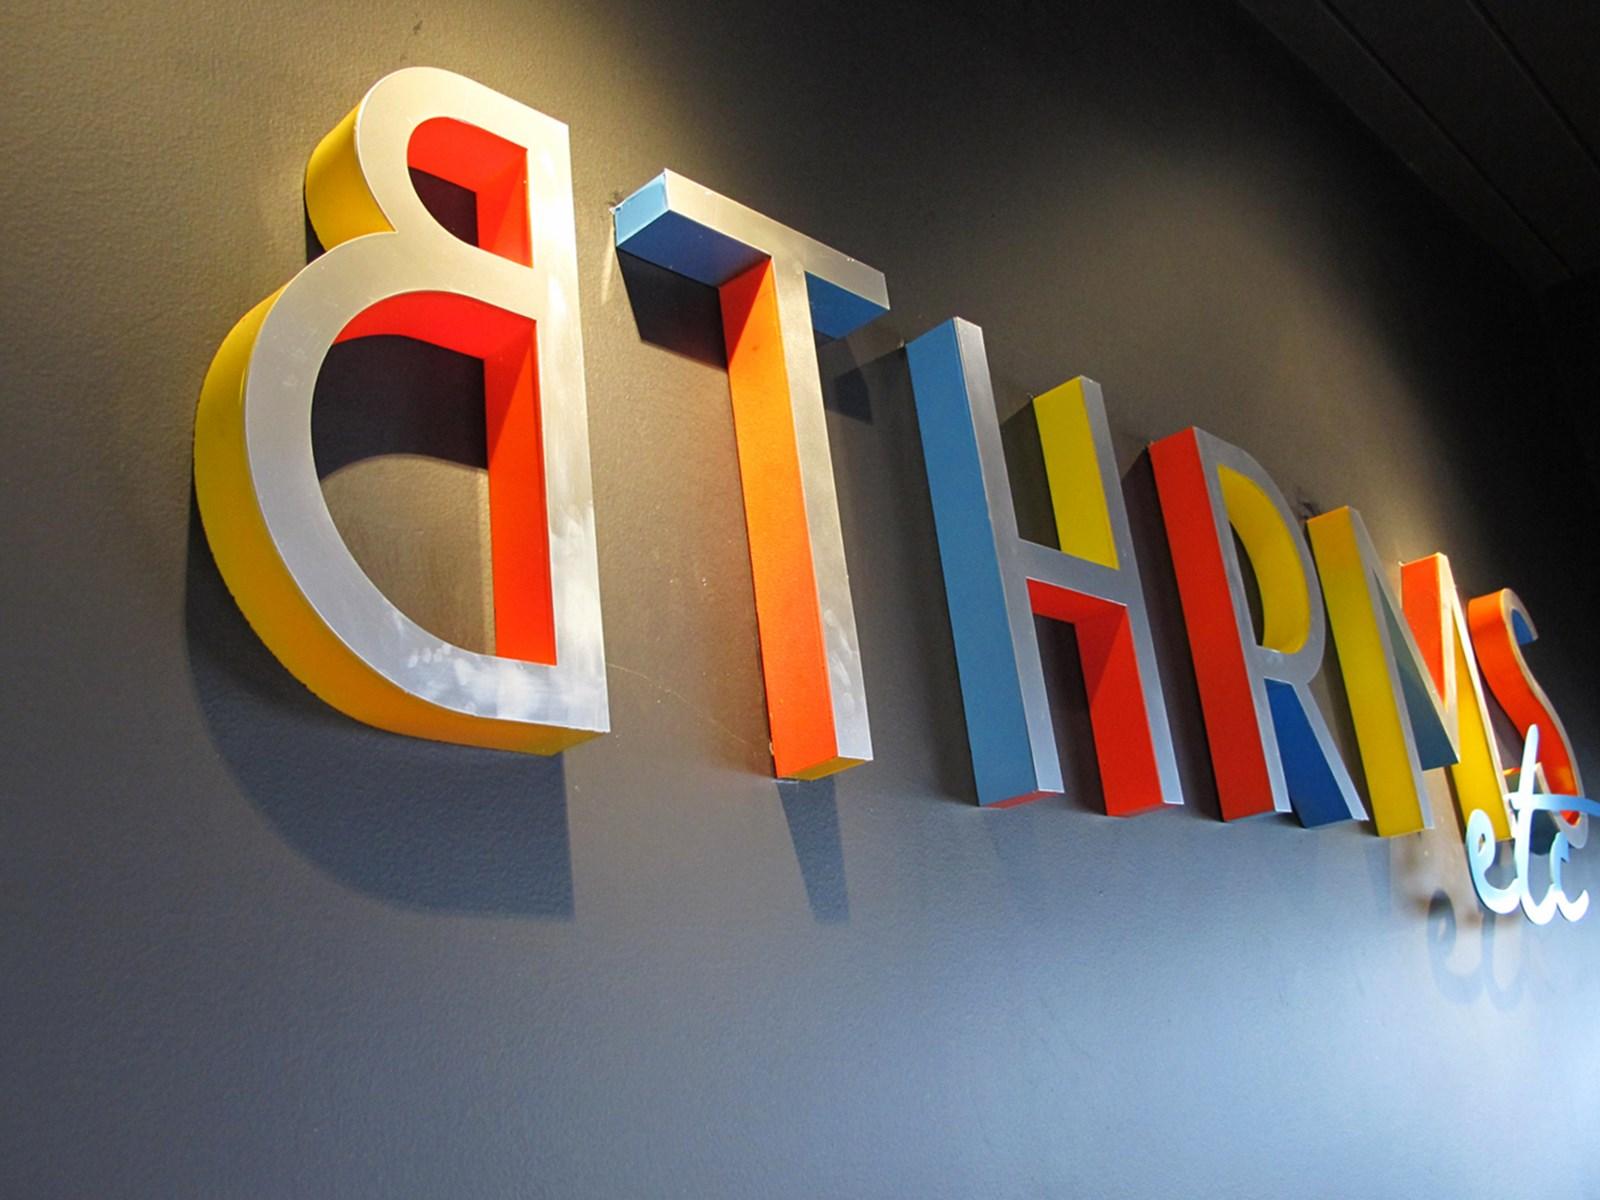 BTHRMS Brand Logo at the Gallery in Petaling Jaya.